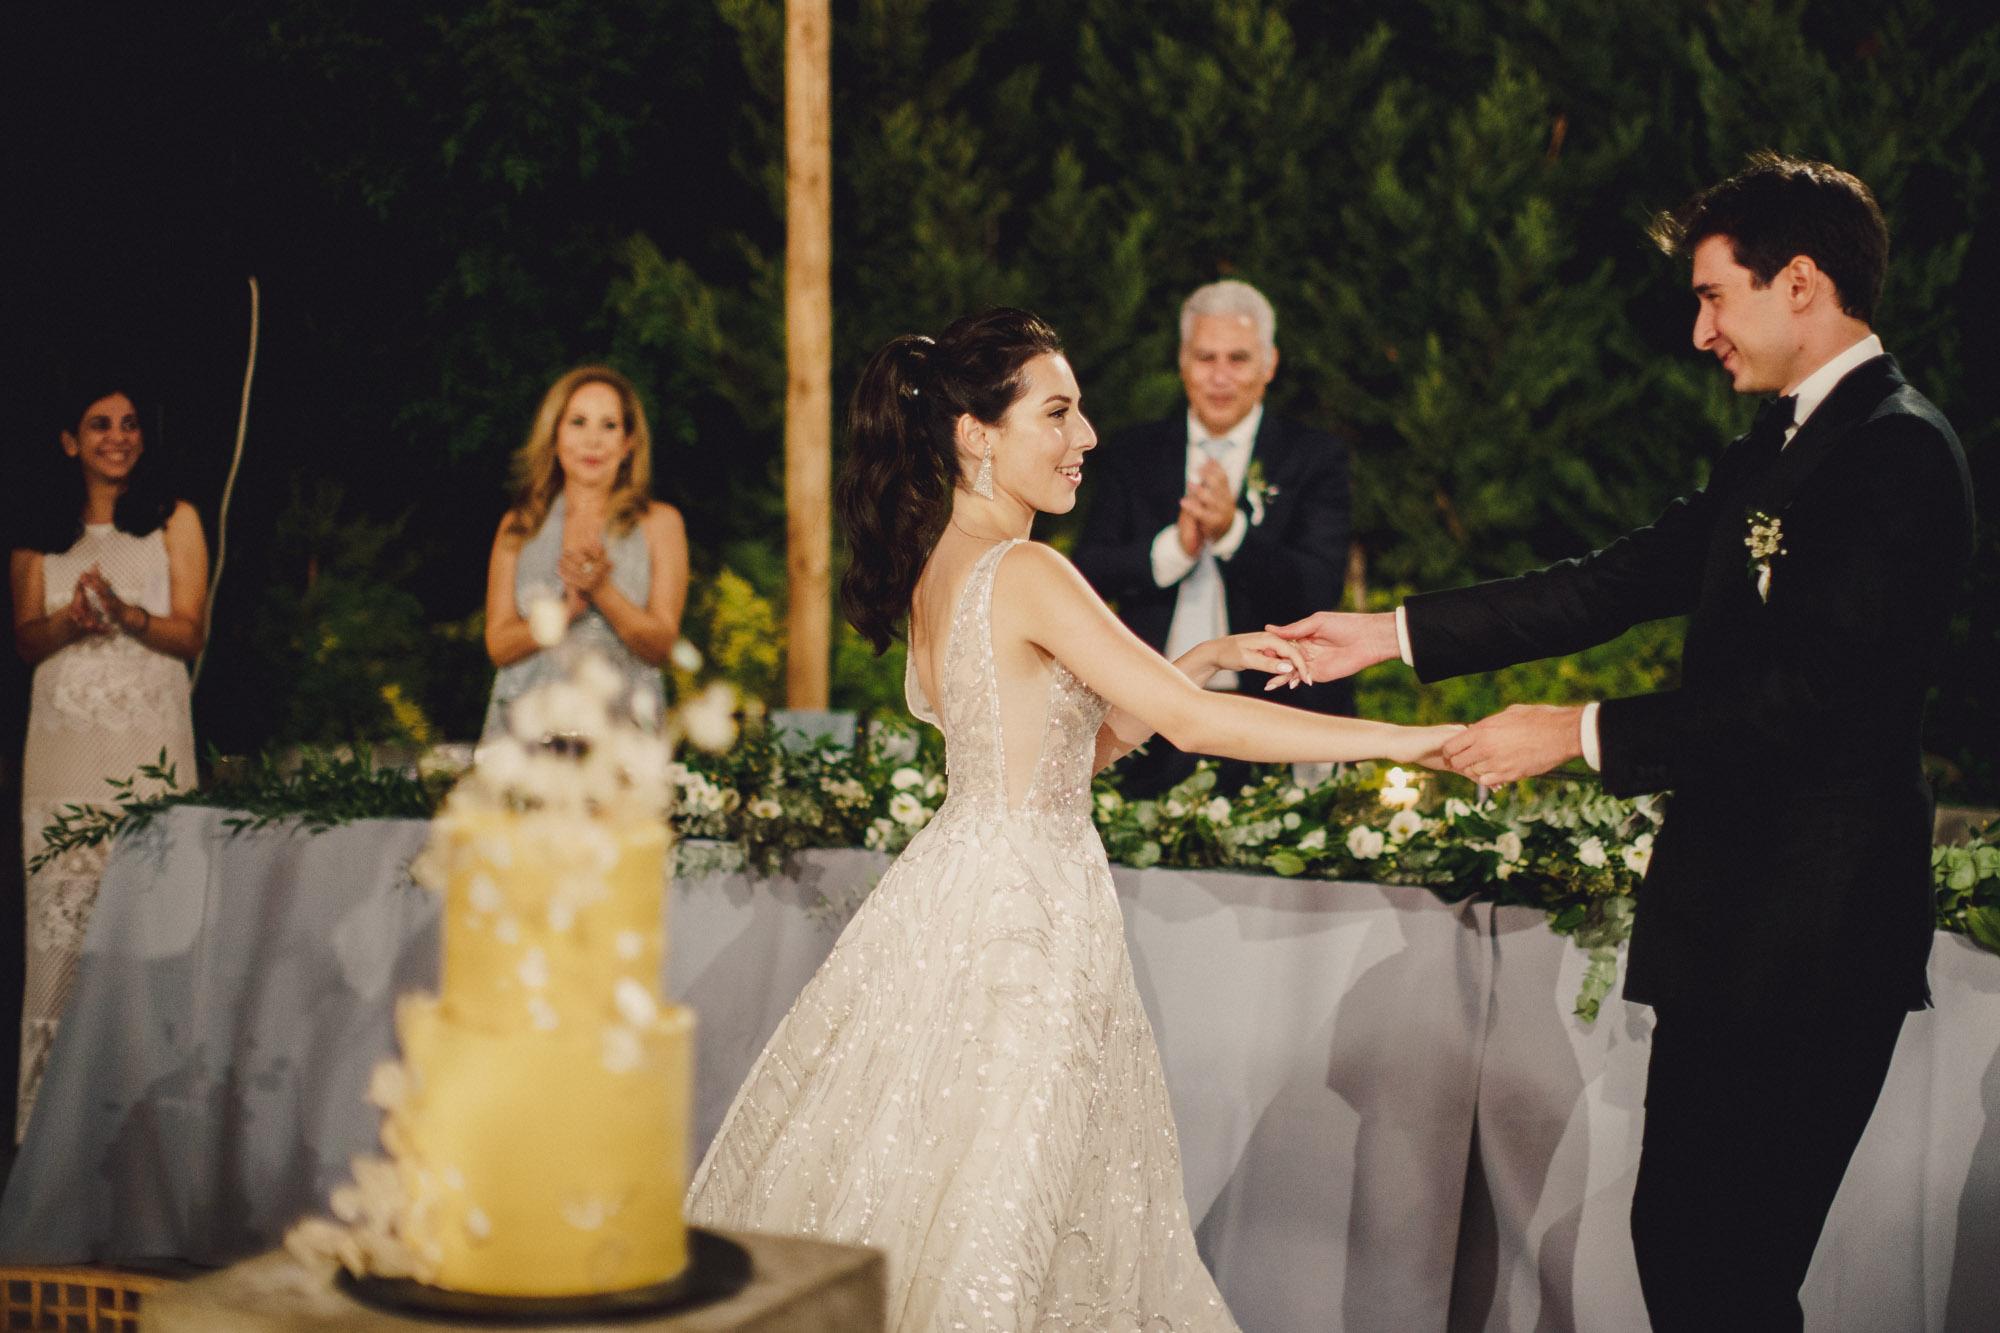 Award Winning Wedding Photography